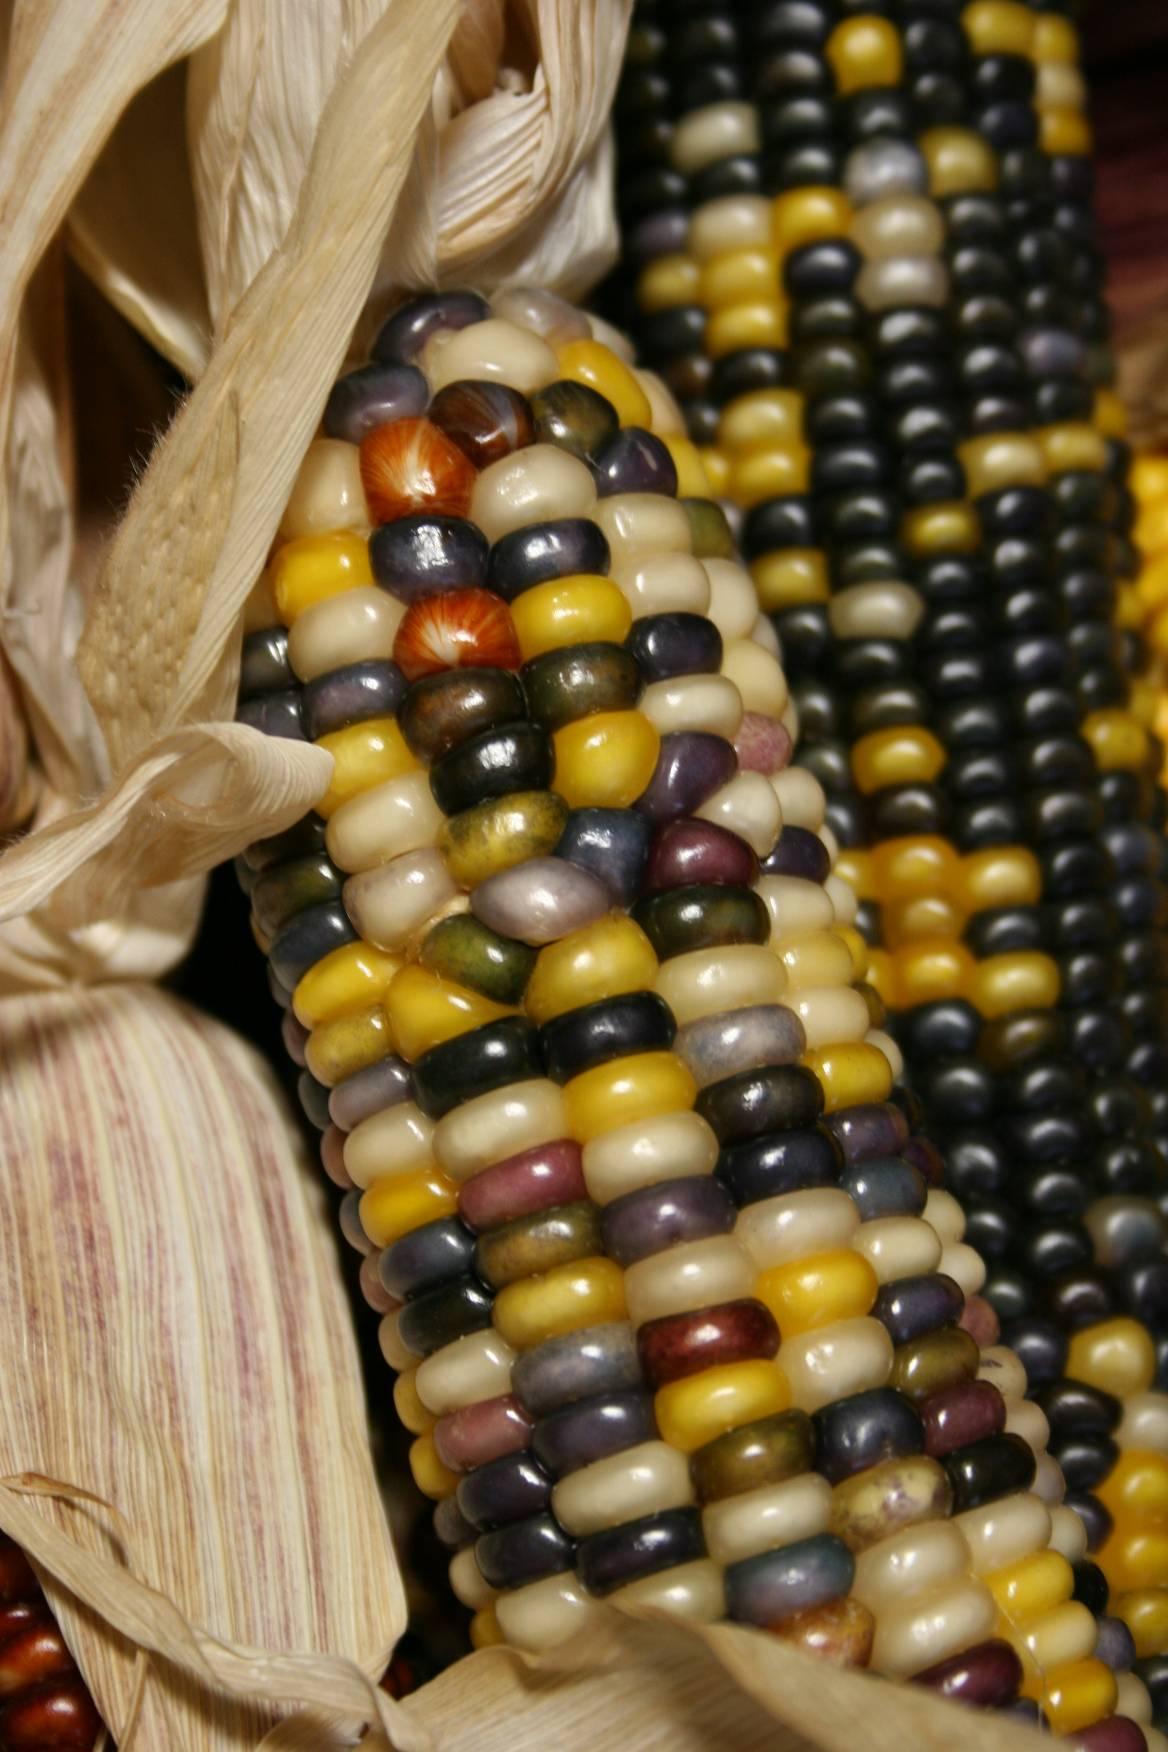 Corn on the cob - 3 part 10